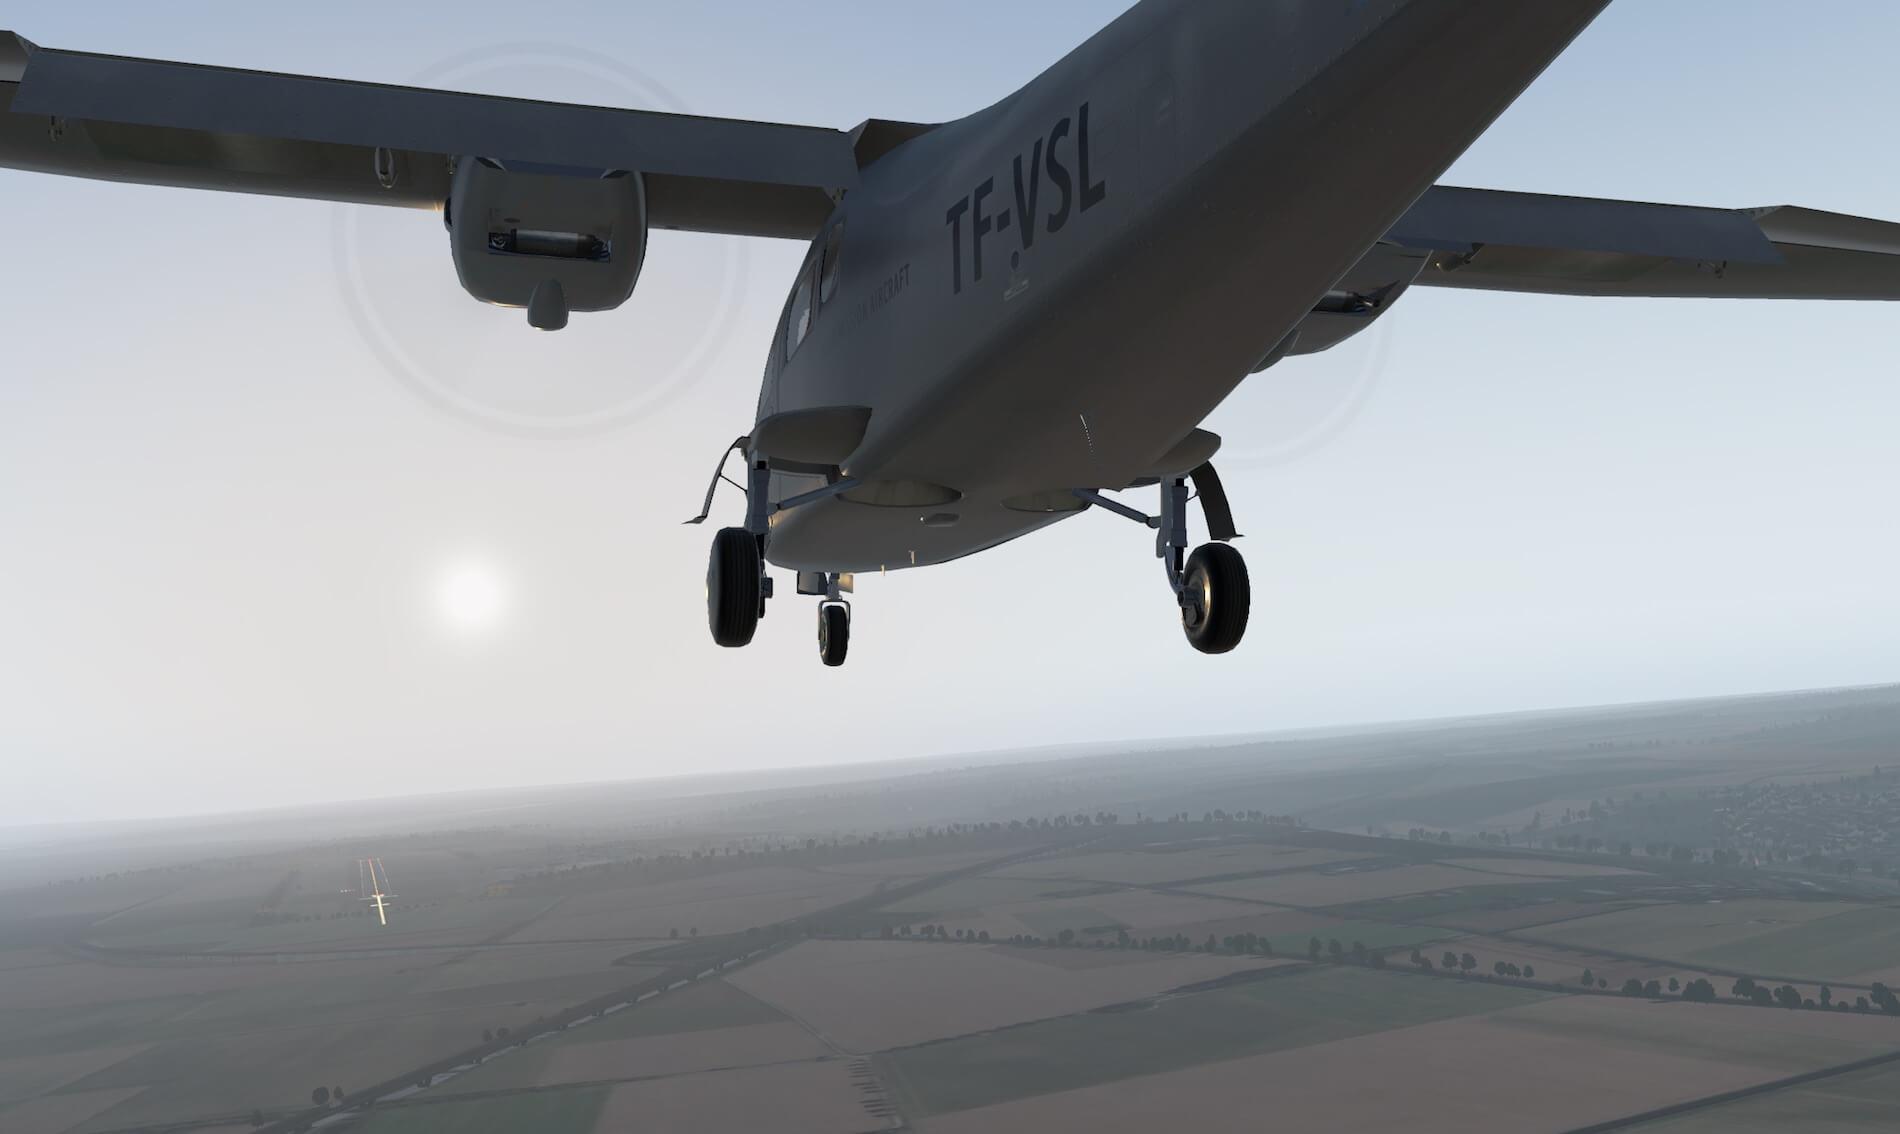 x-plane 11.10 beta 5